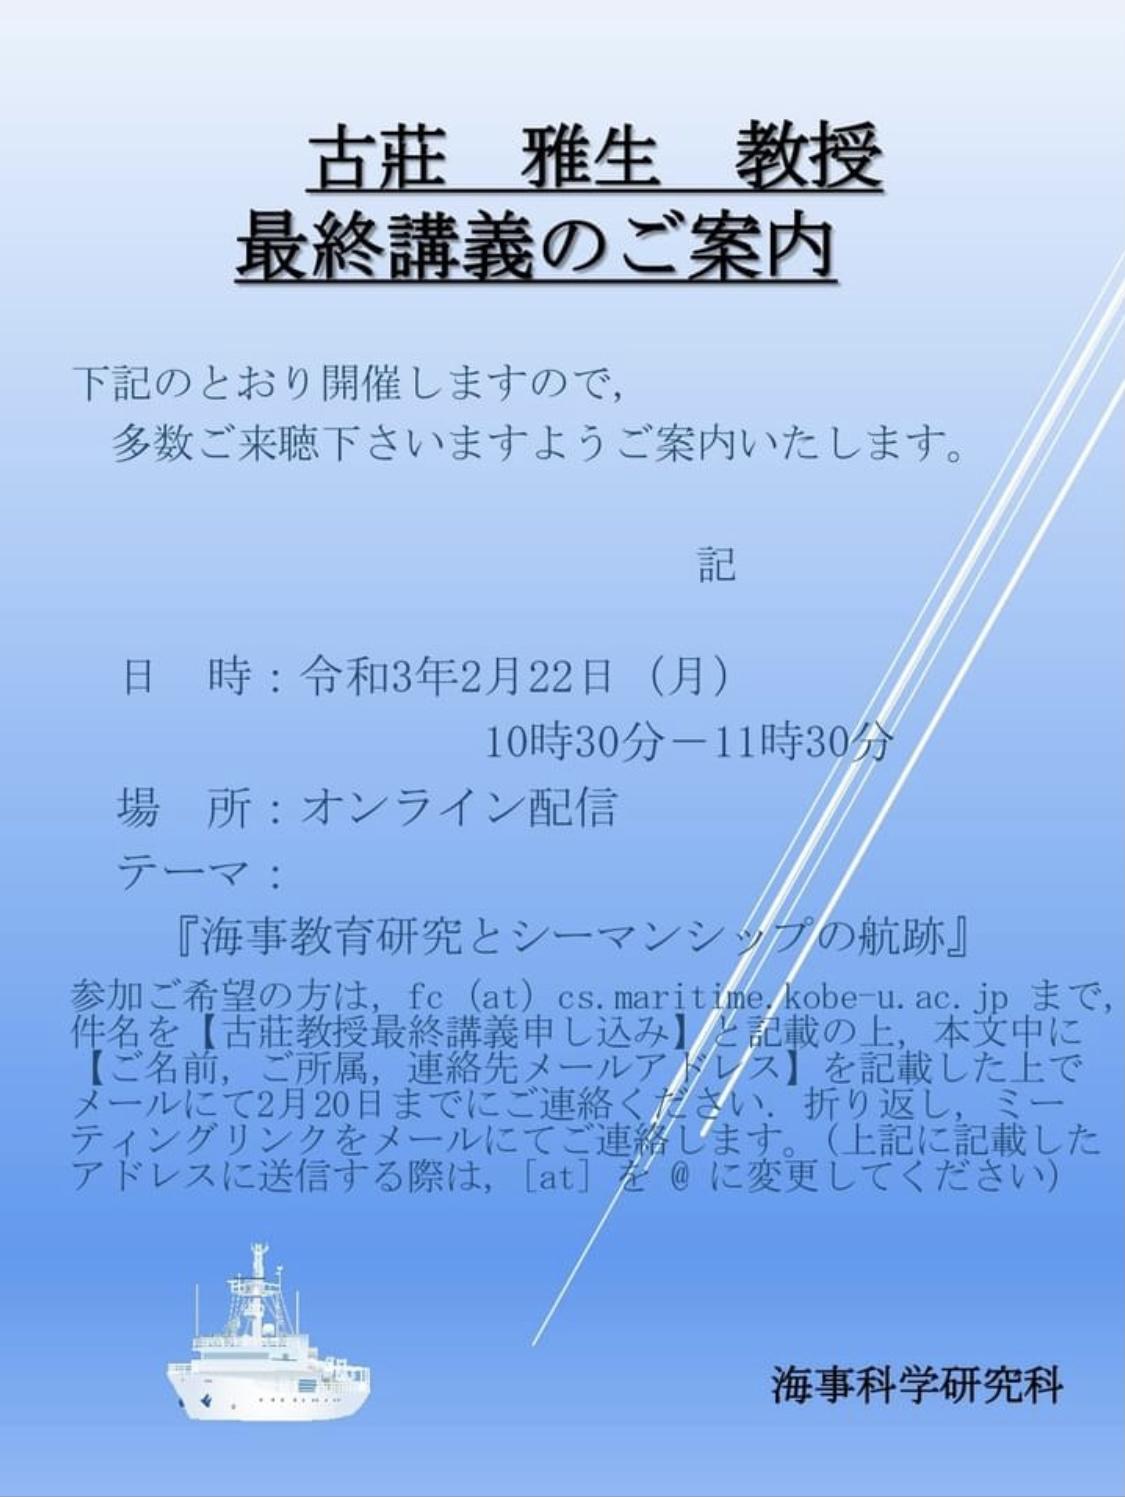 85CF3989-636C-4CEB-9DD8-10CB93FBB25D